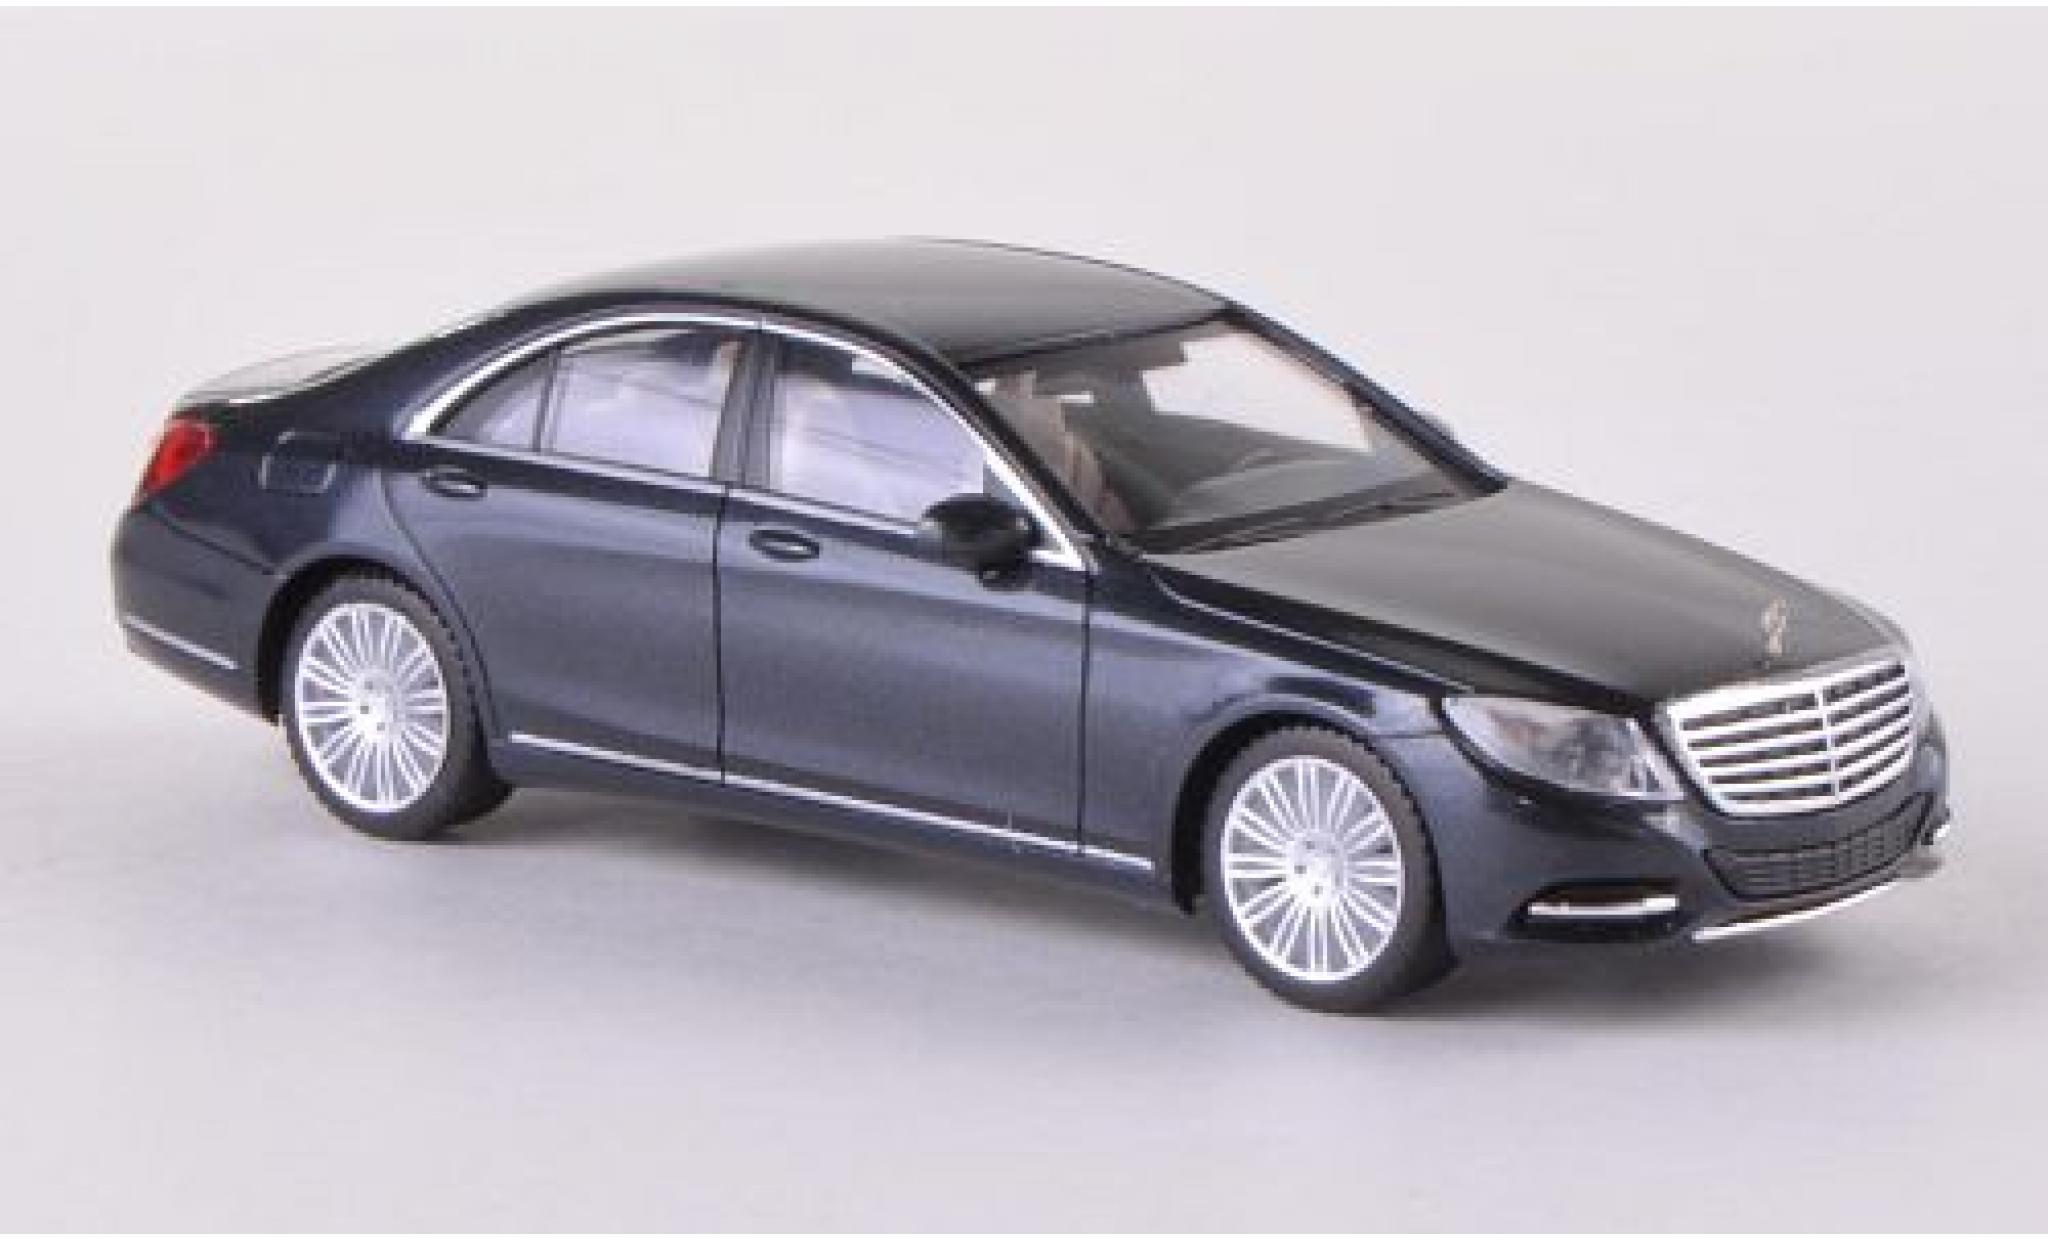 Mercedes Classe S 1/87 I Herpa (W222) metallise anthrazit 2013